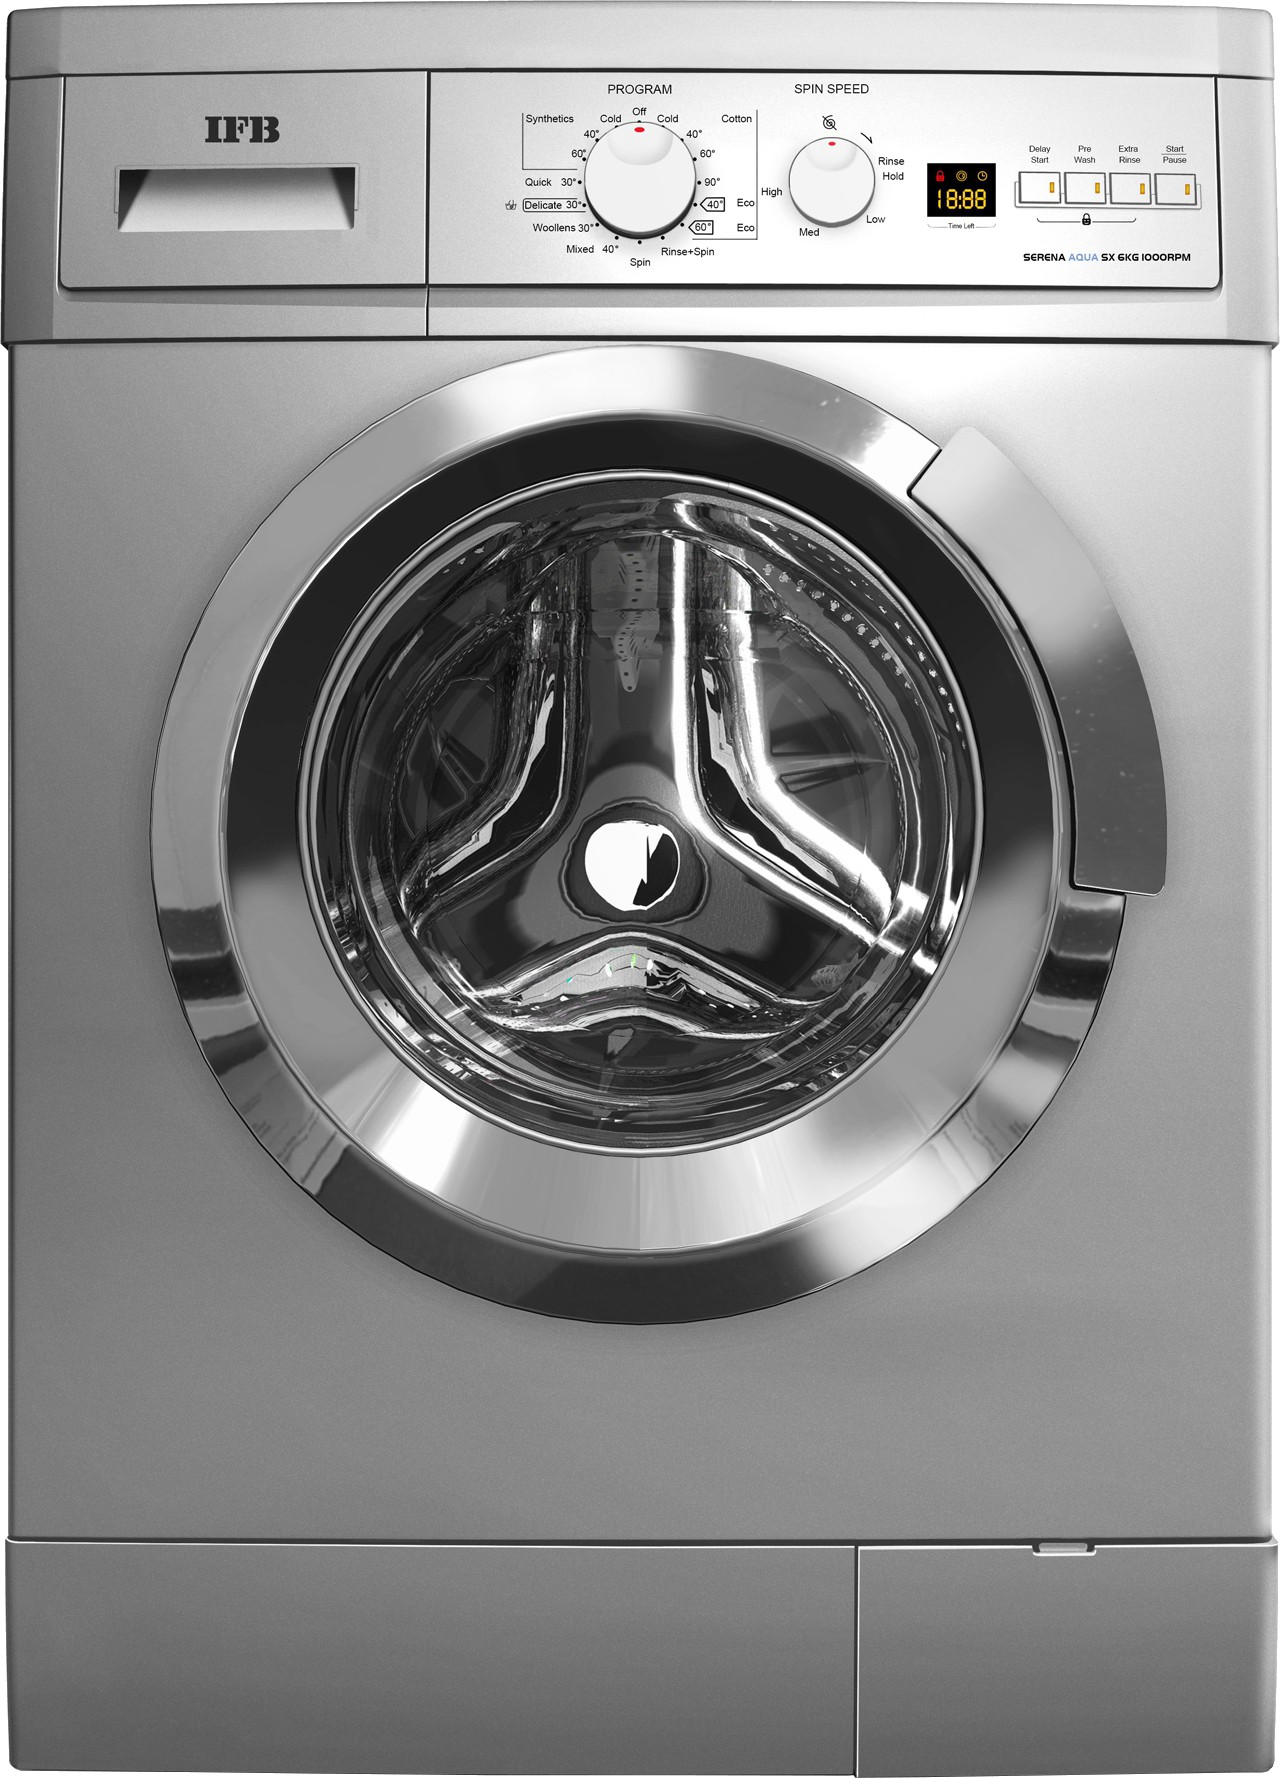 IFB 6 kg Fully Automatic Front Load Washing Machine(Serena Aqua SX LDT) (IFB)  Buy Online